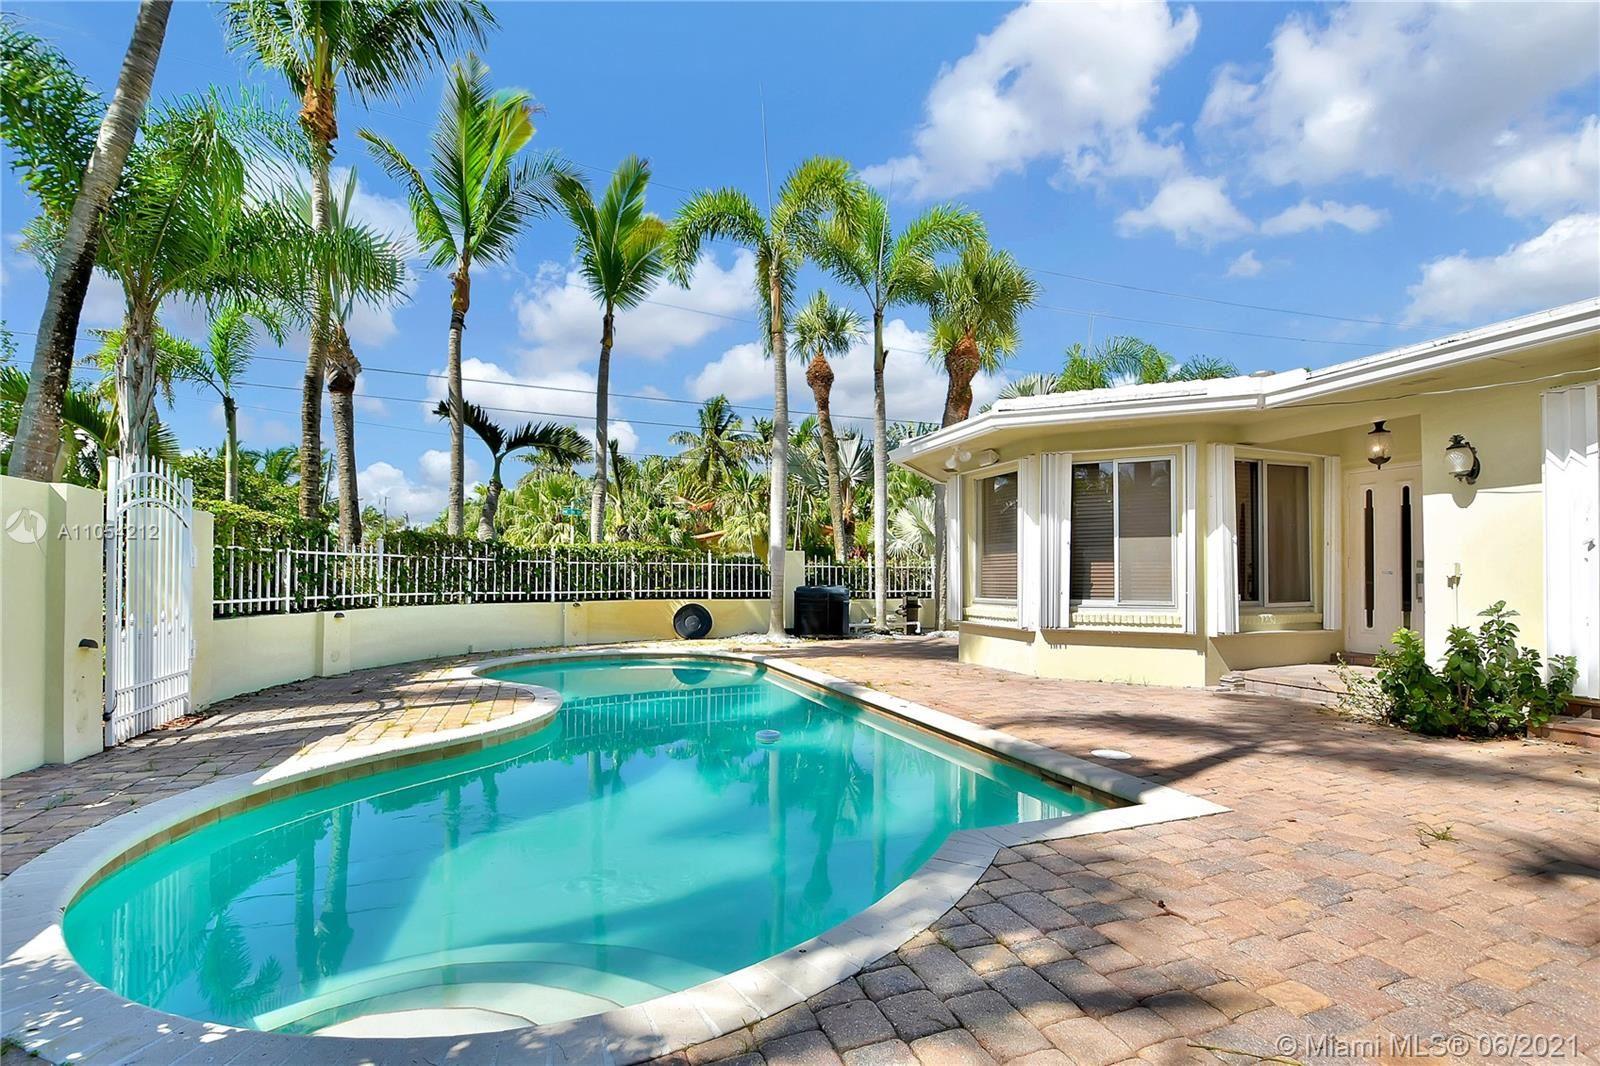 3001 N Atlantic Blvd, Fort Lauderdale, FL 33308 - #: A11054212